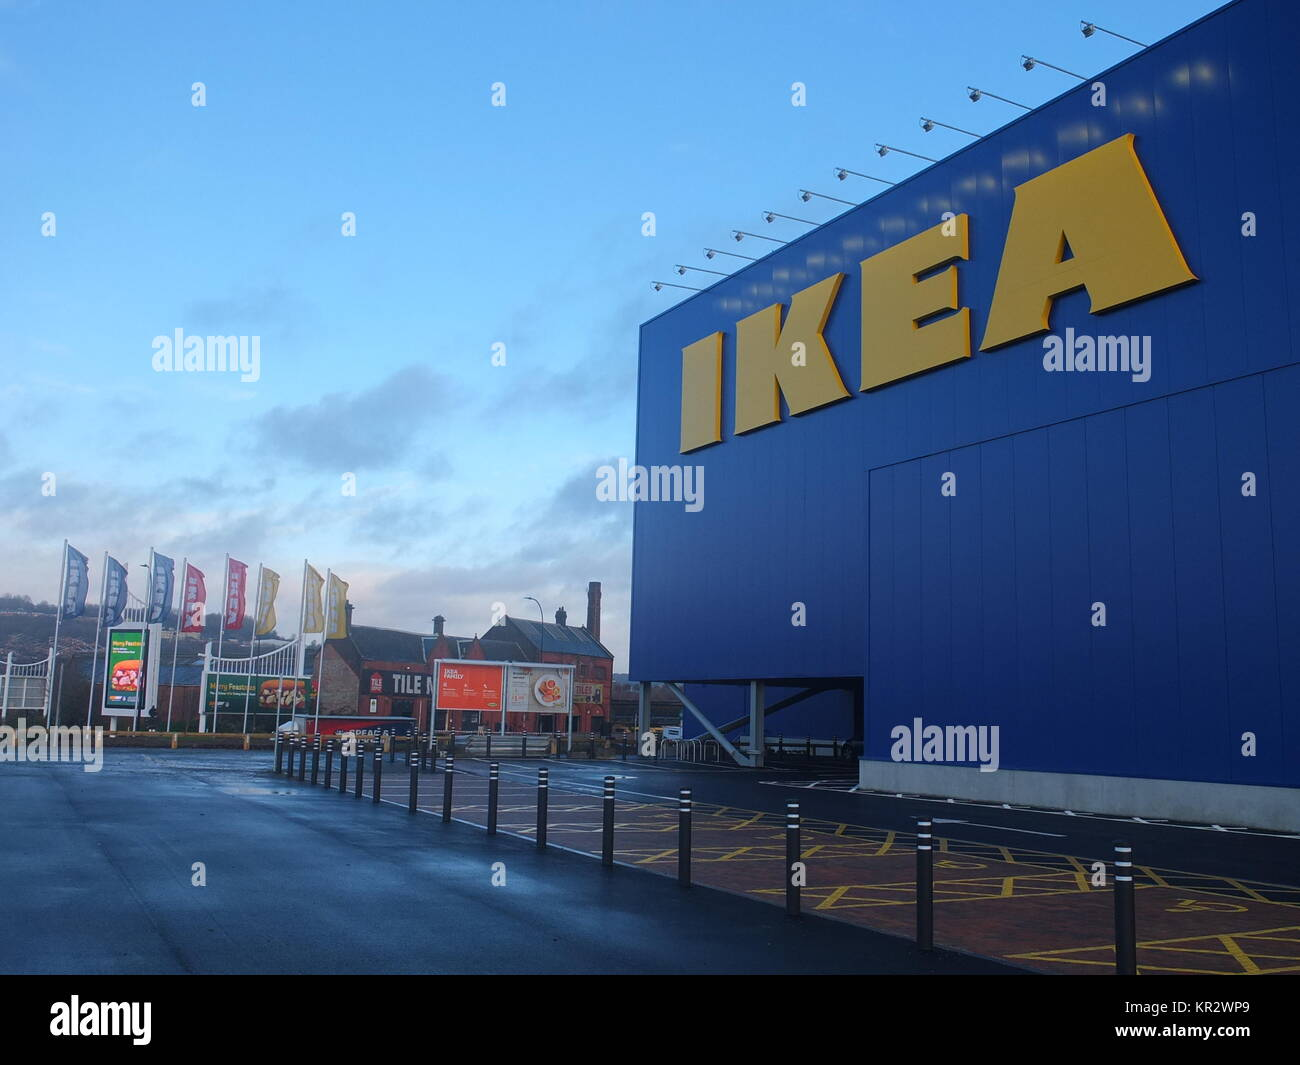 Ikea store exterior stock photos ikea store exterior for Ikea exterior